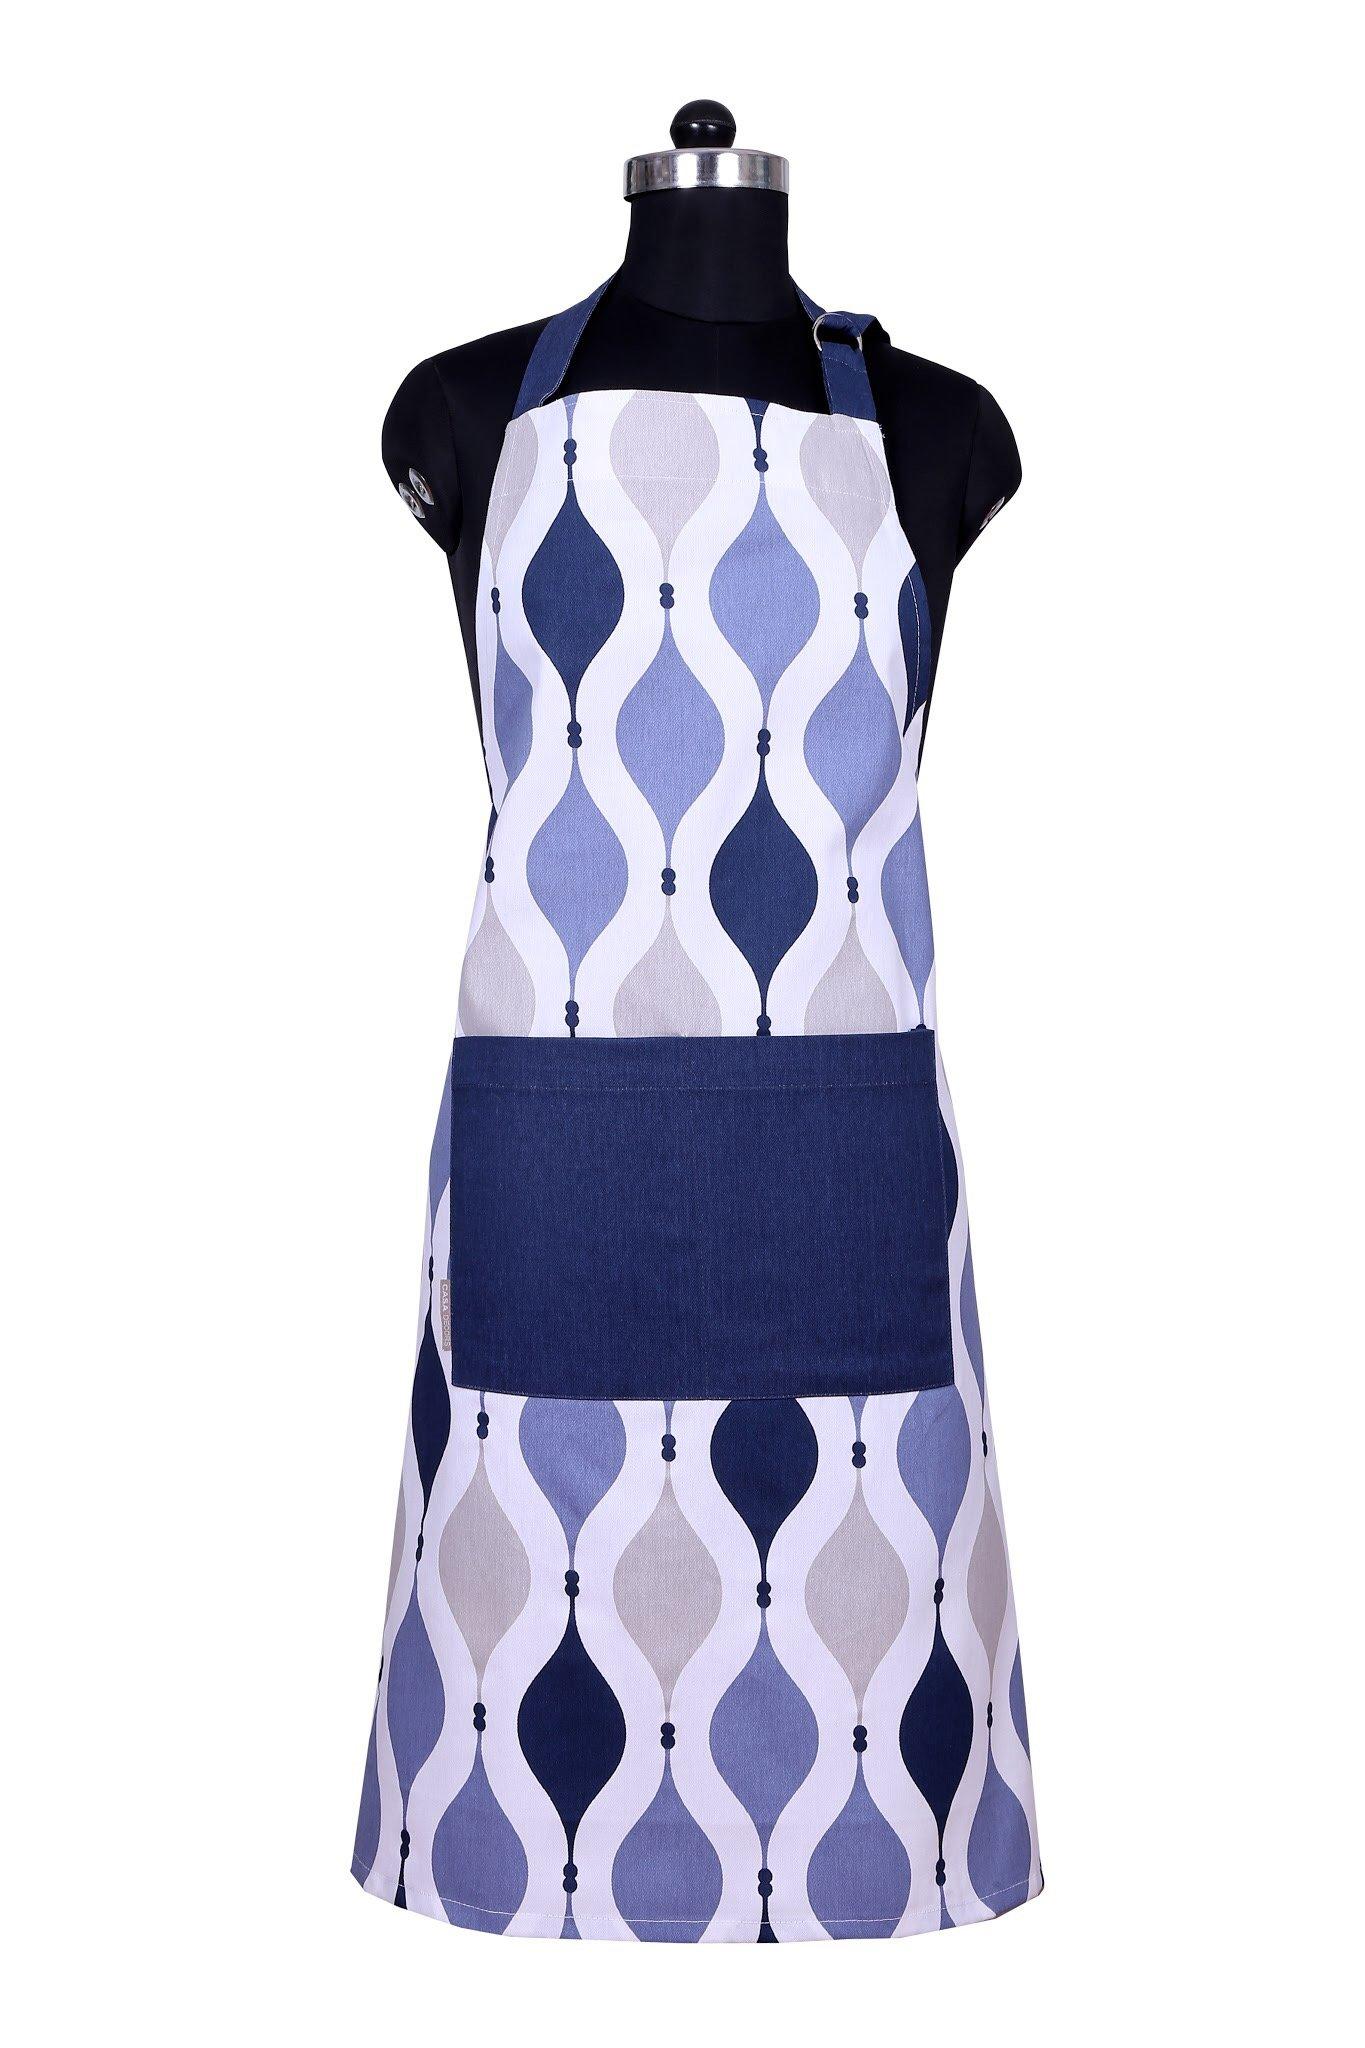 Apron,Geometric Blue Design, Aprons for Women with Pockets,100% Natural Cotton, Adjustable Neck & Waist ties, Machine Washable, Cute Apron by CASA DECORS